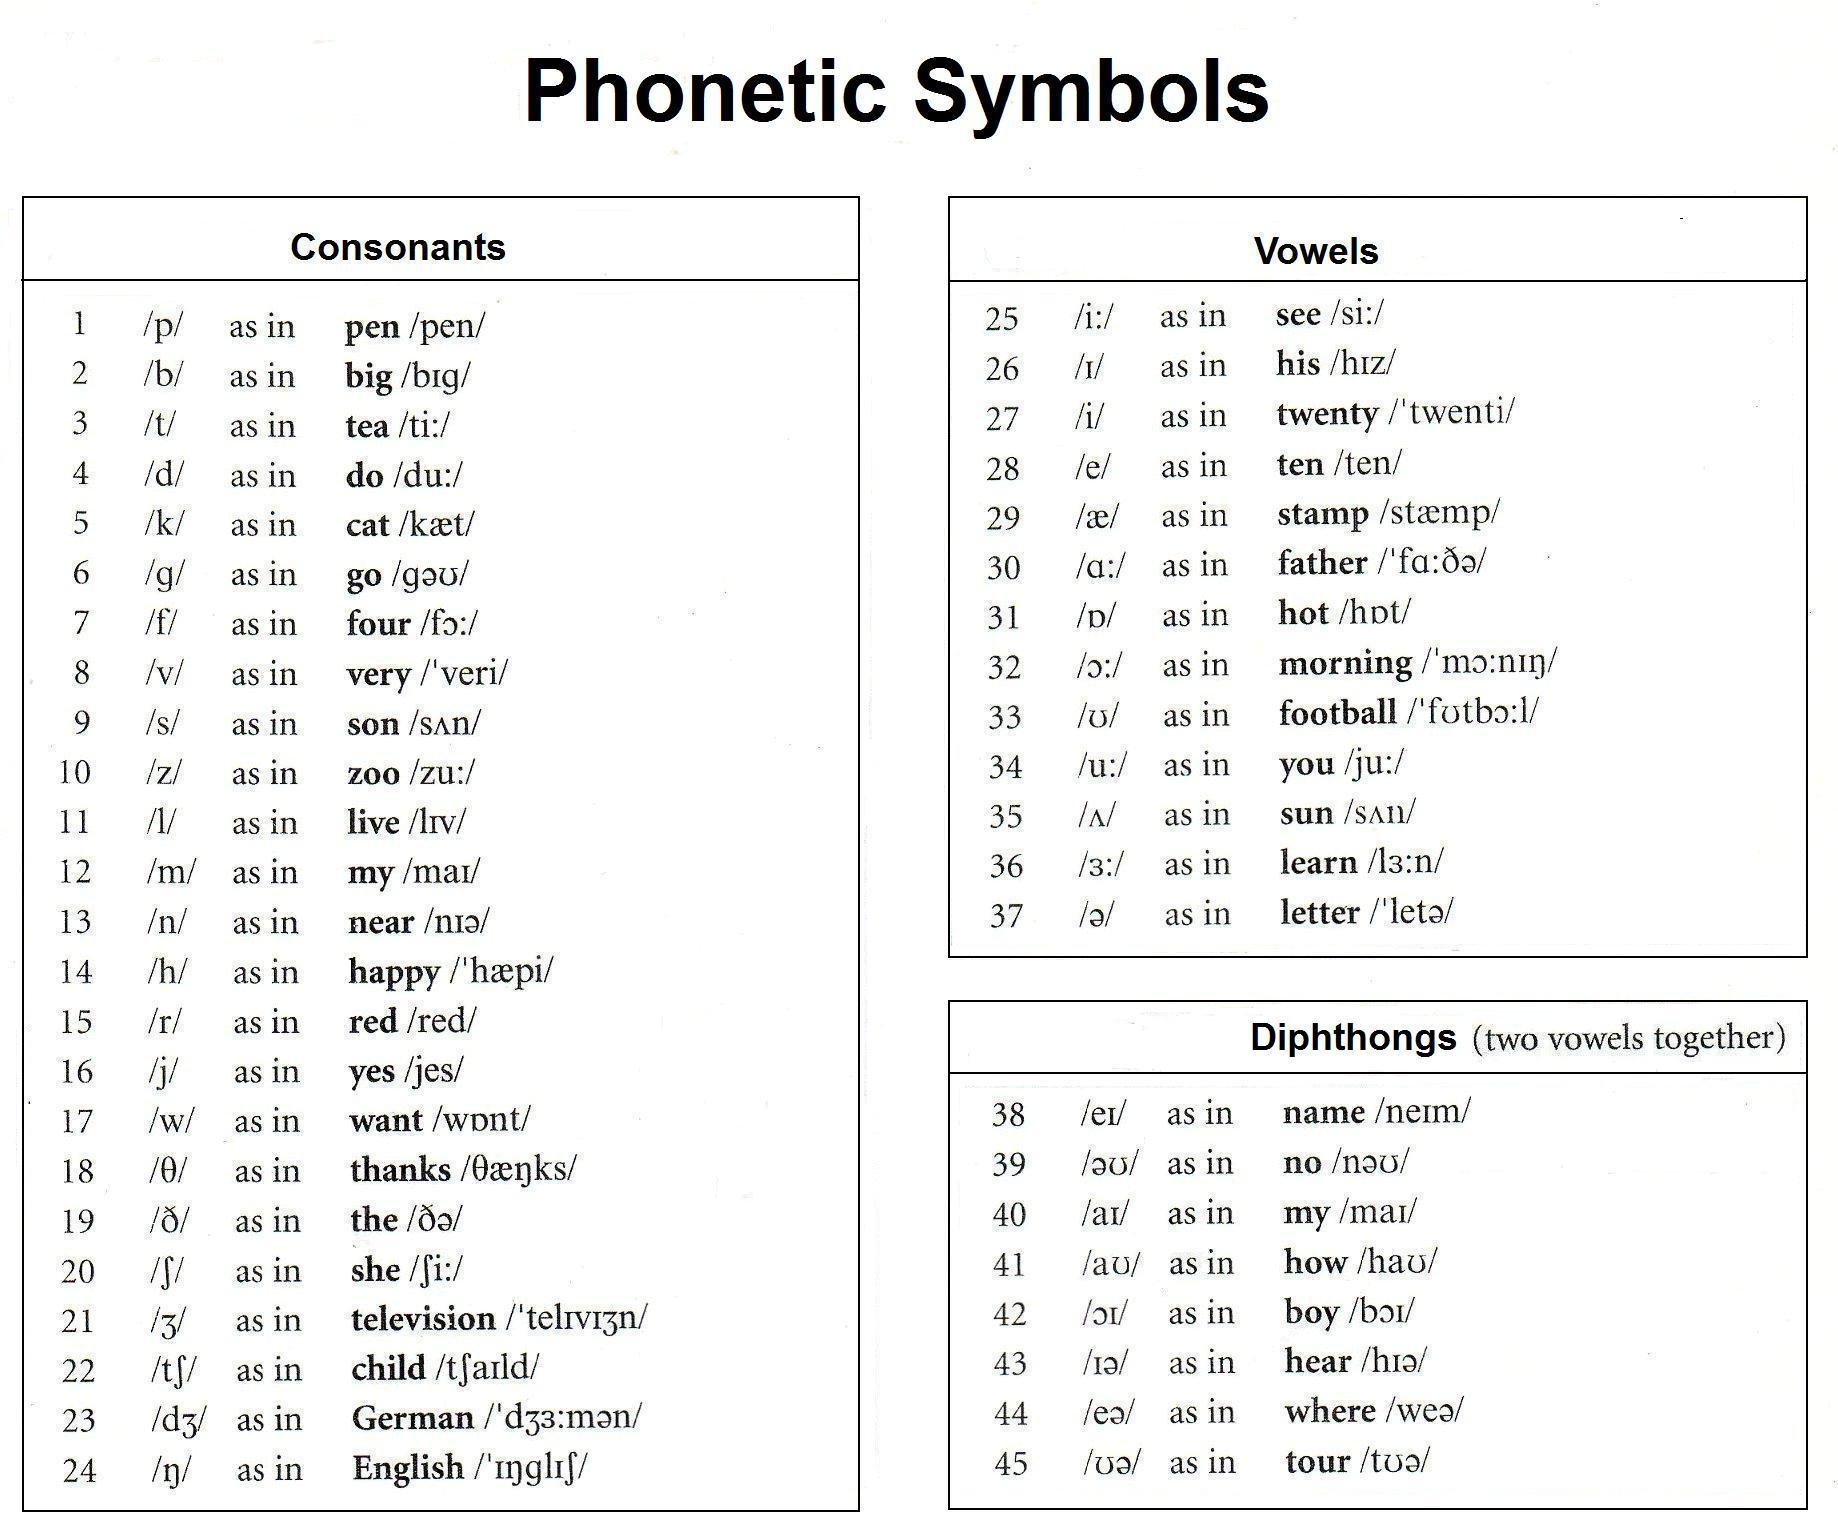 Opinions On Phonetics